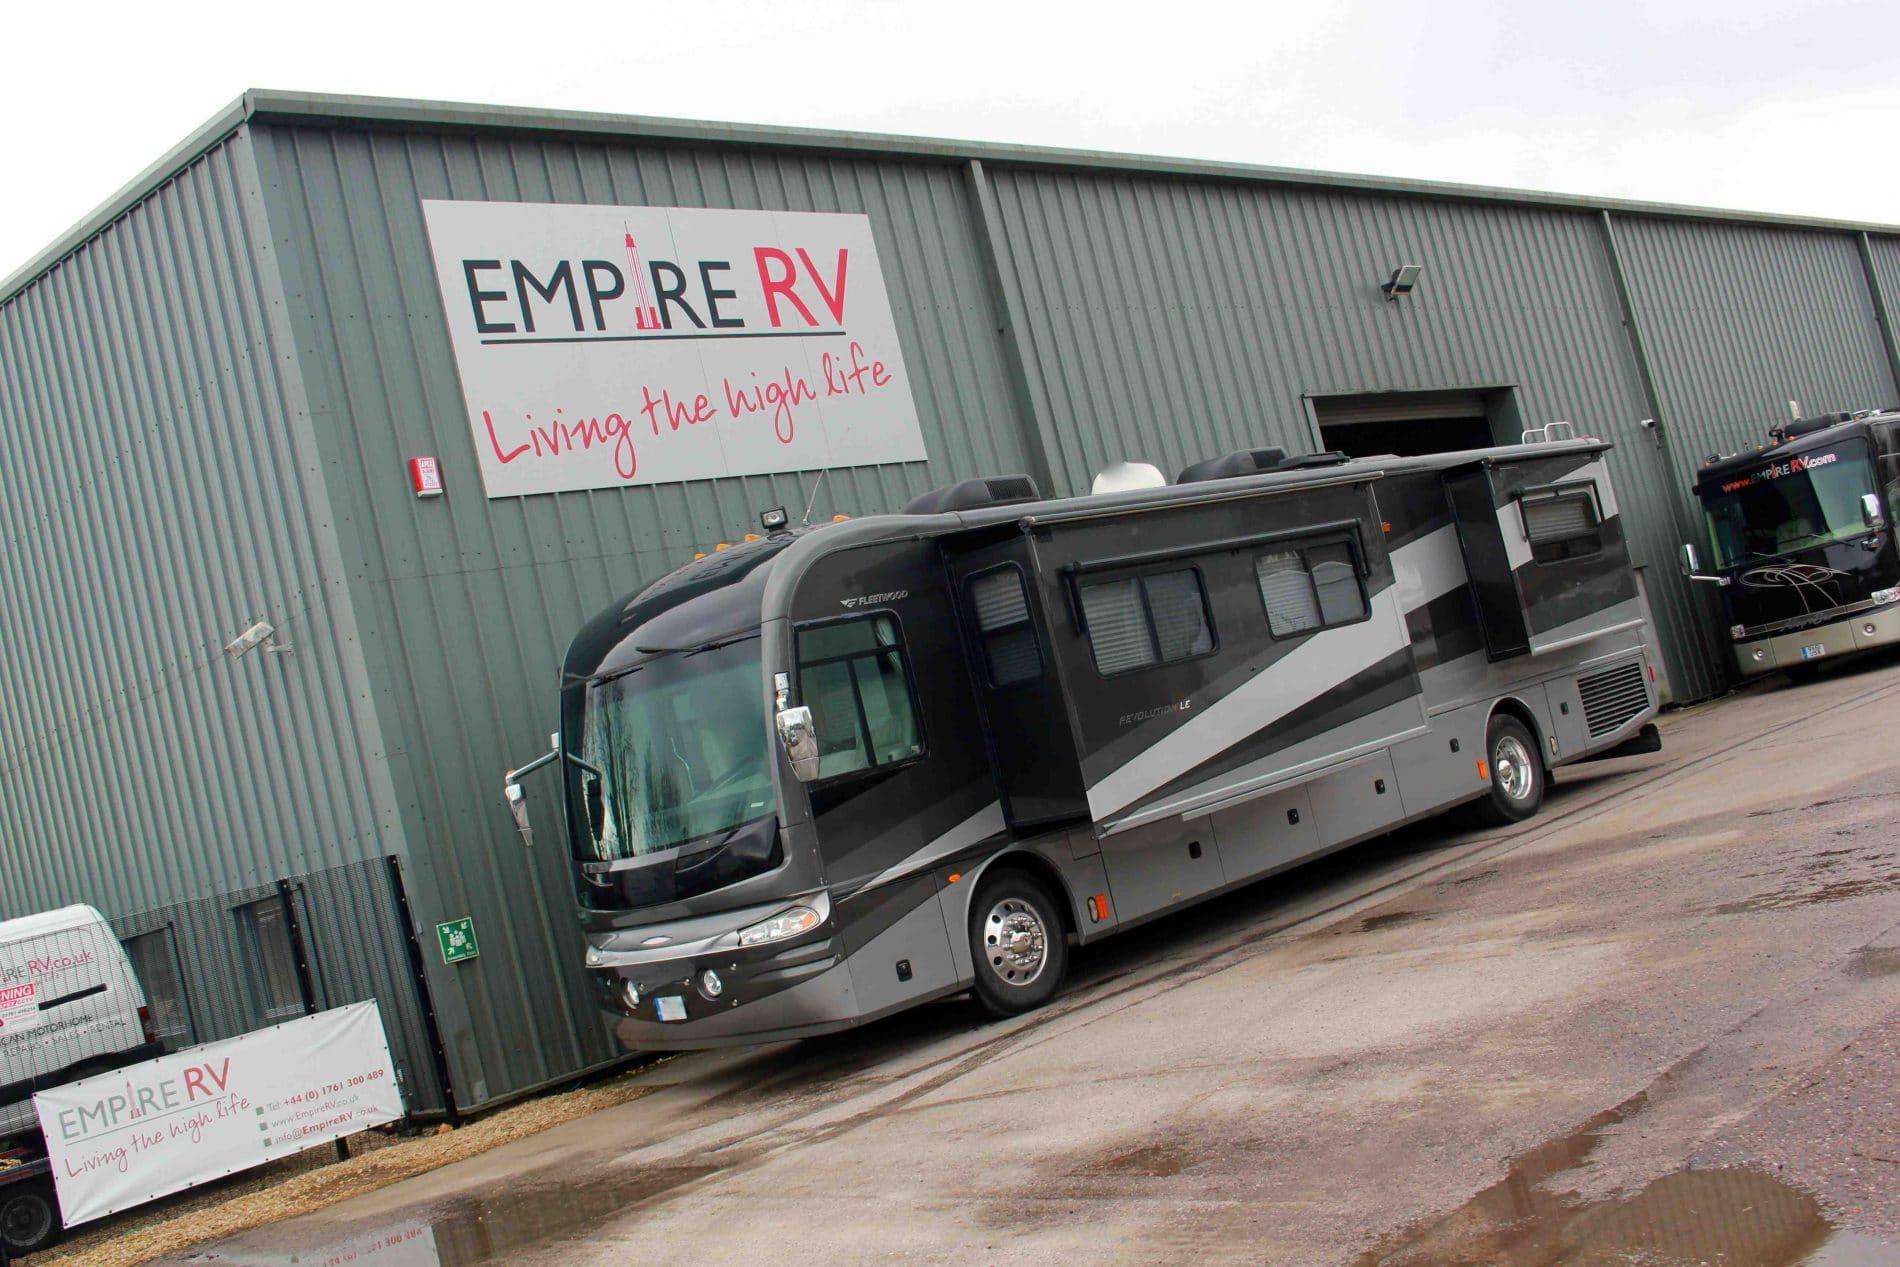 Fleetwood Revolution 40L Motorhomes for sale rent – (c) Empire RV